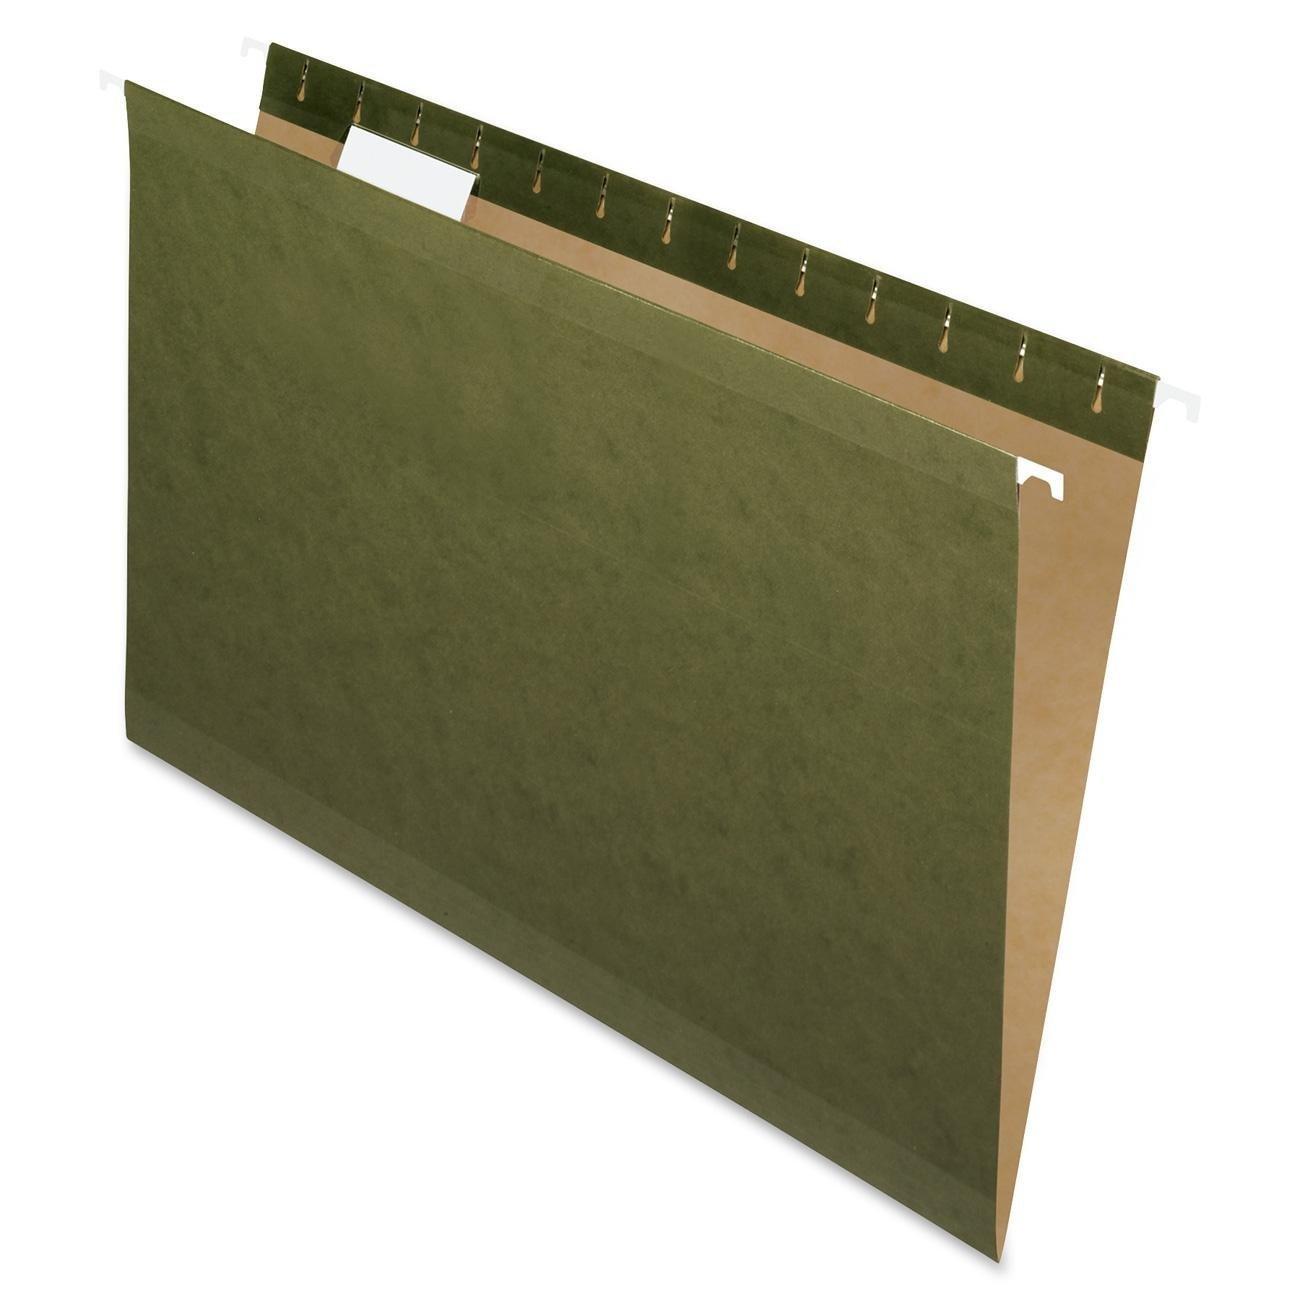 Pendaflex Standard Green, Legal size, Hanging File Folder,25 per box 2-Pack